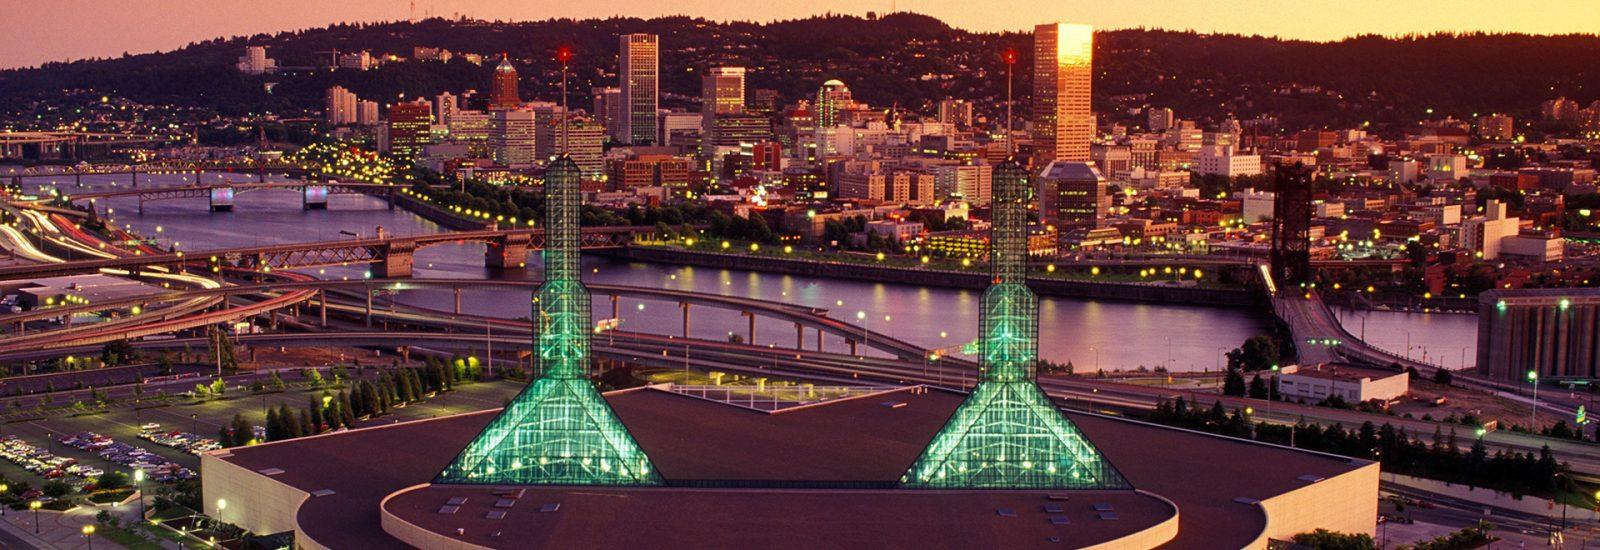 Portland Convention Center dusk